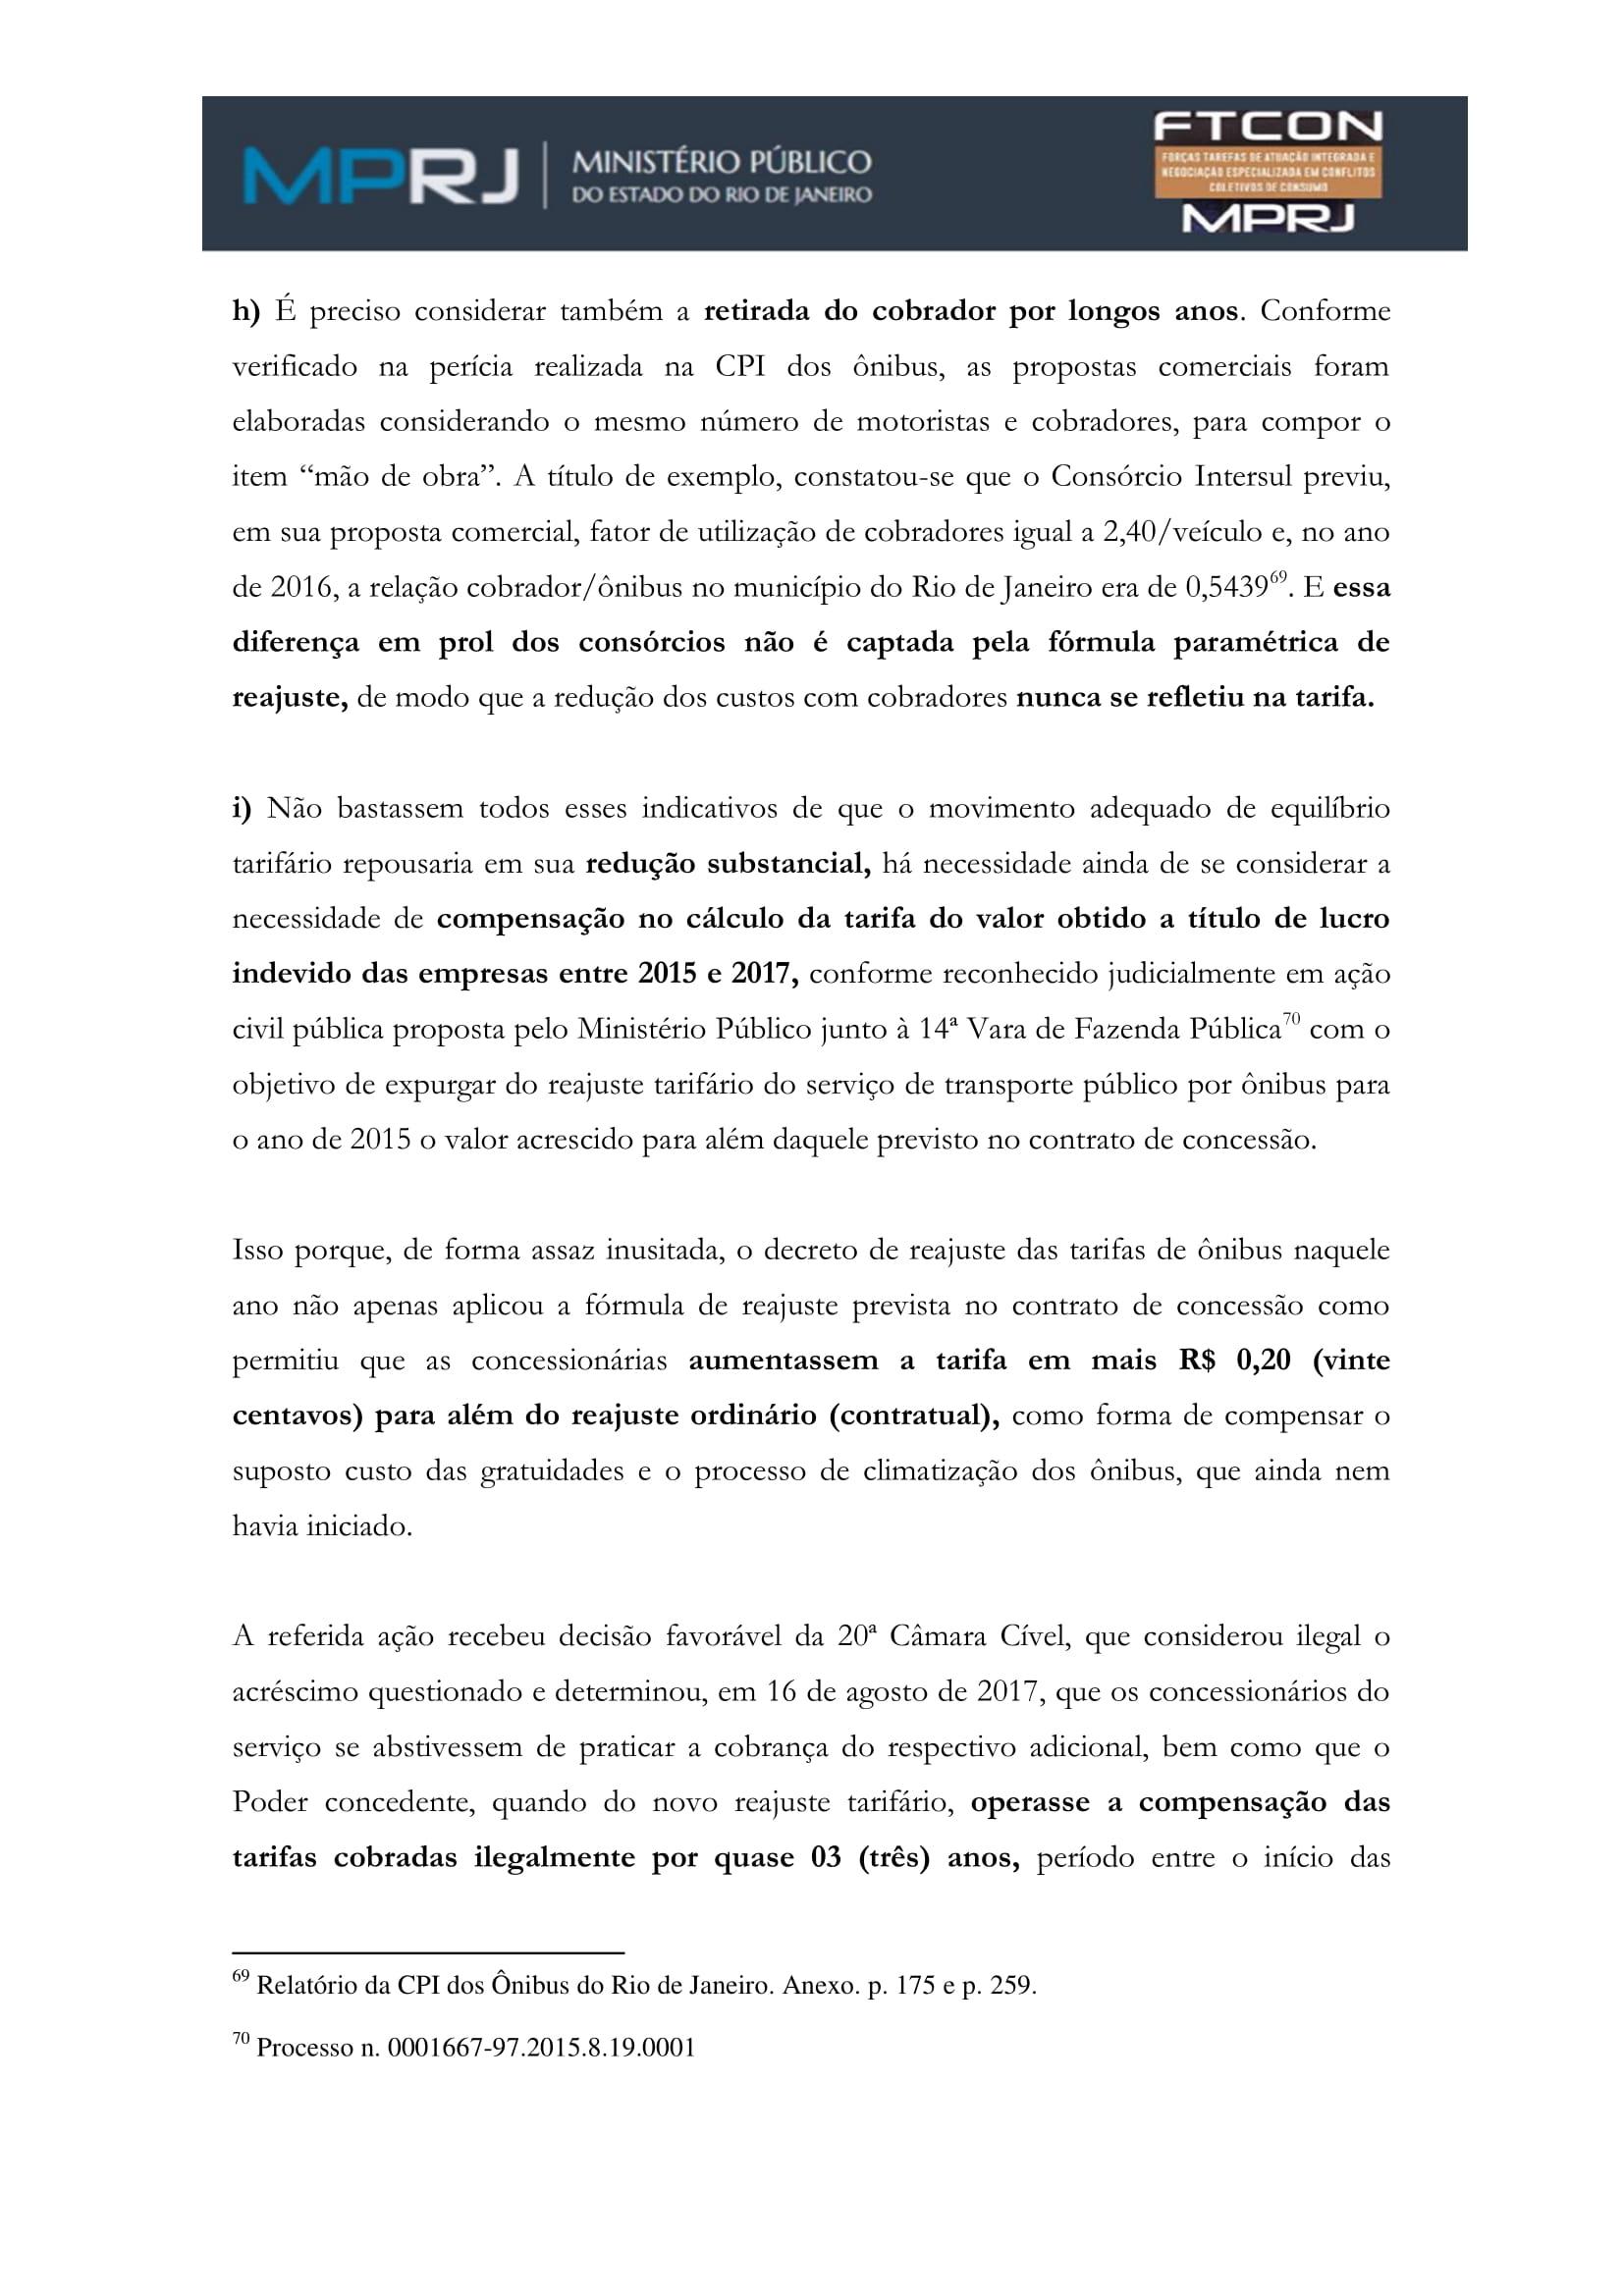 acp_caducidade_onibus_dr_rt-080